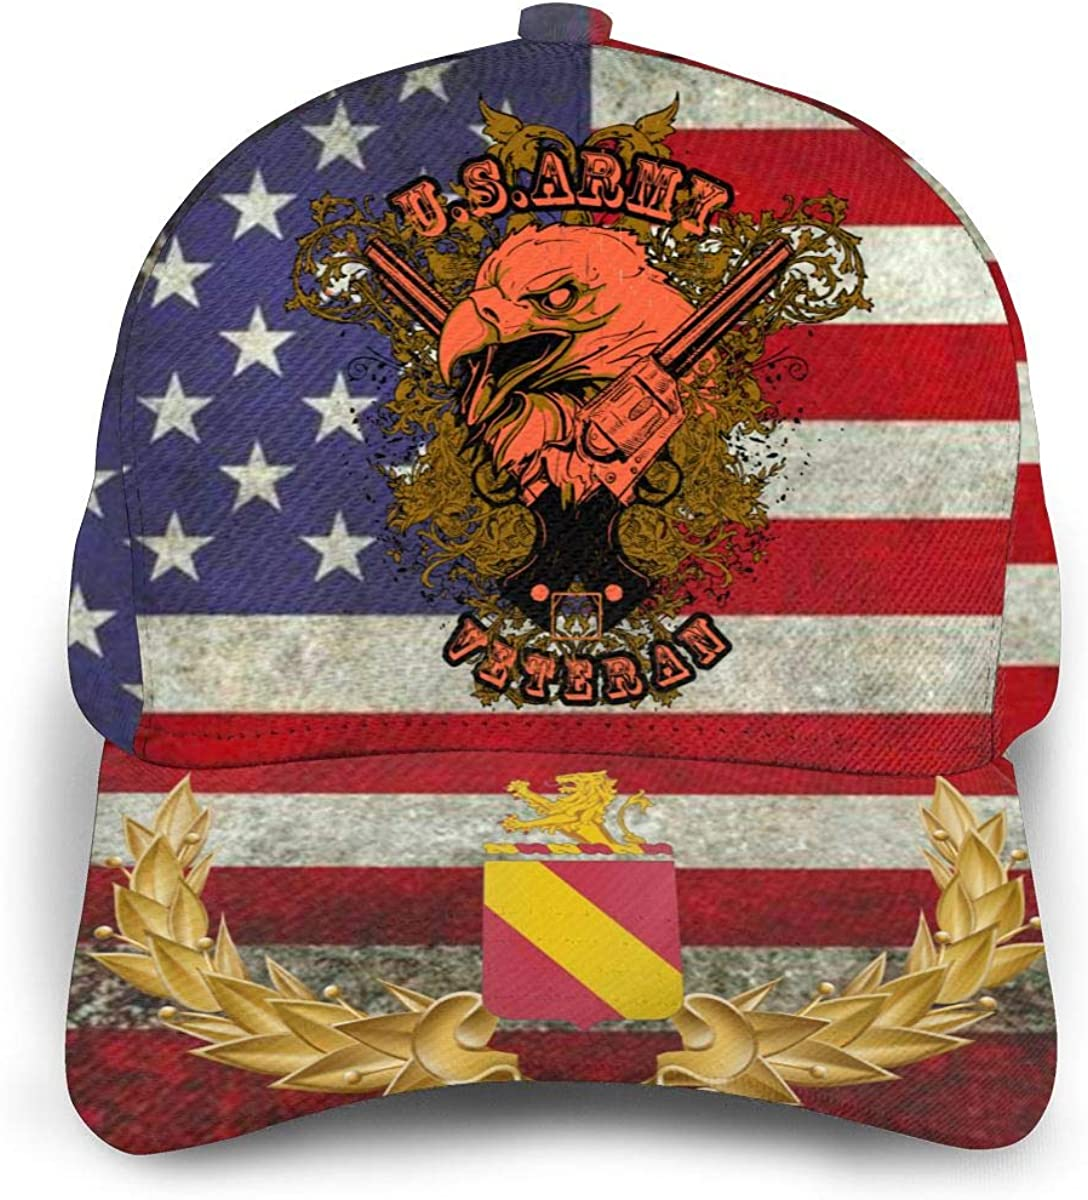 35th Field Artillery Regiment American Eagle Baseball Cap Unisex Outdoor Sun Hat